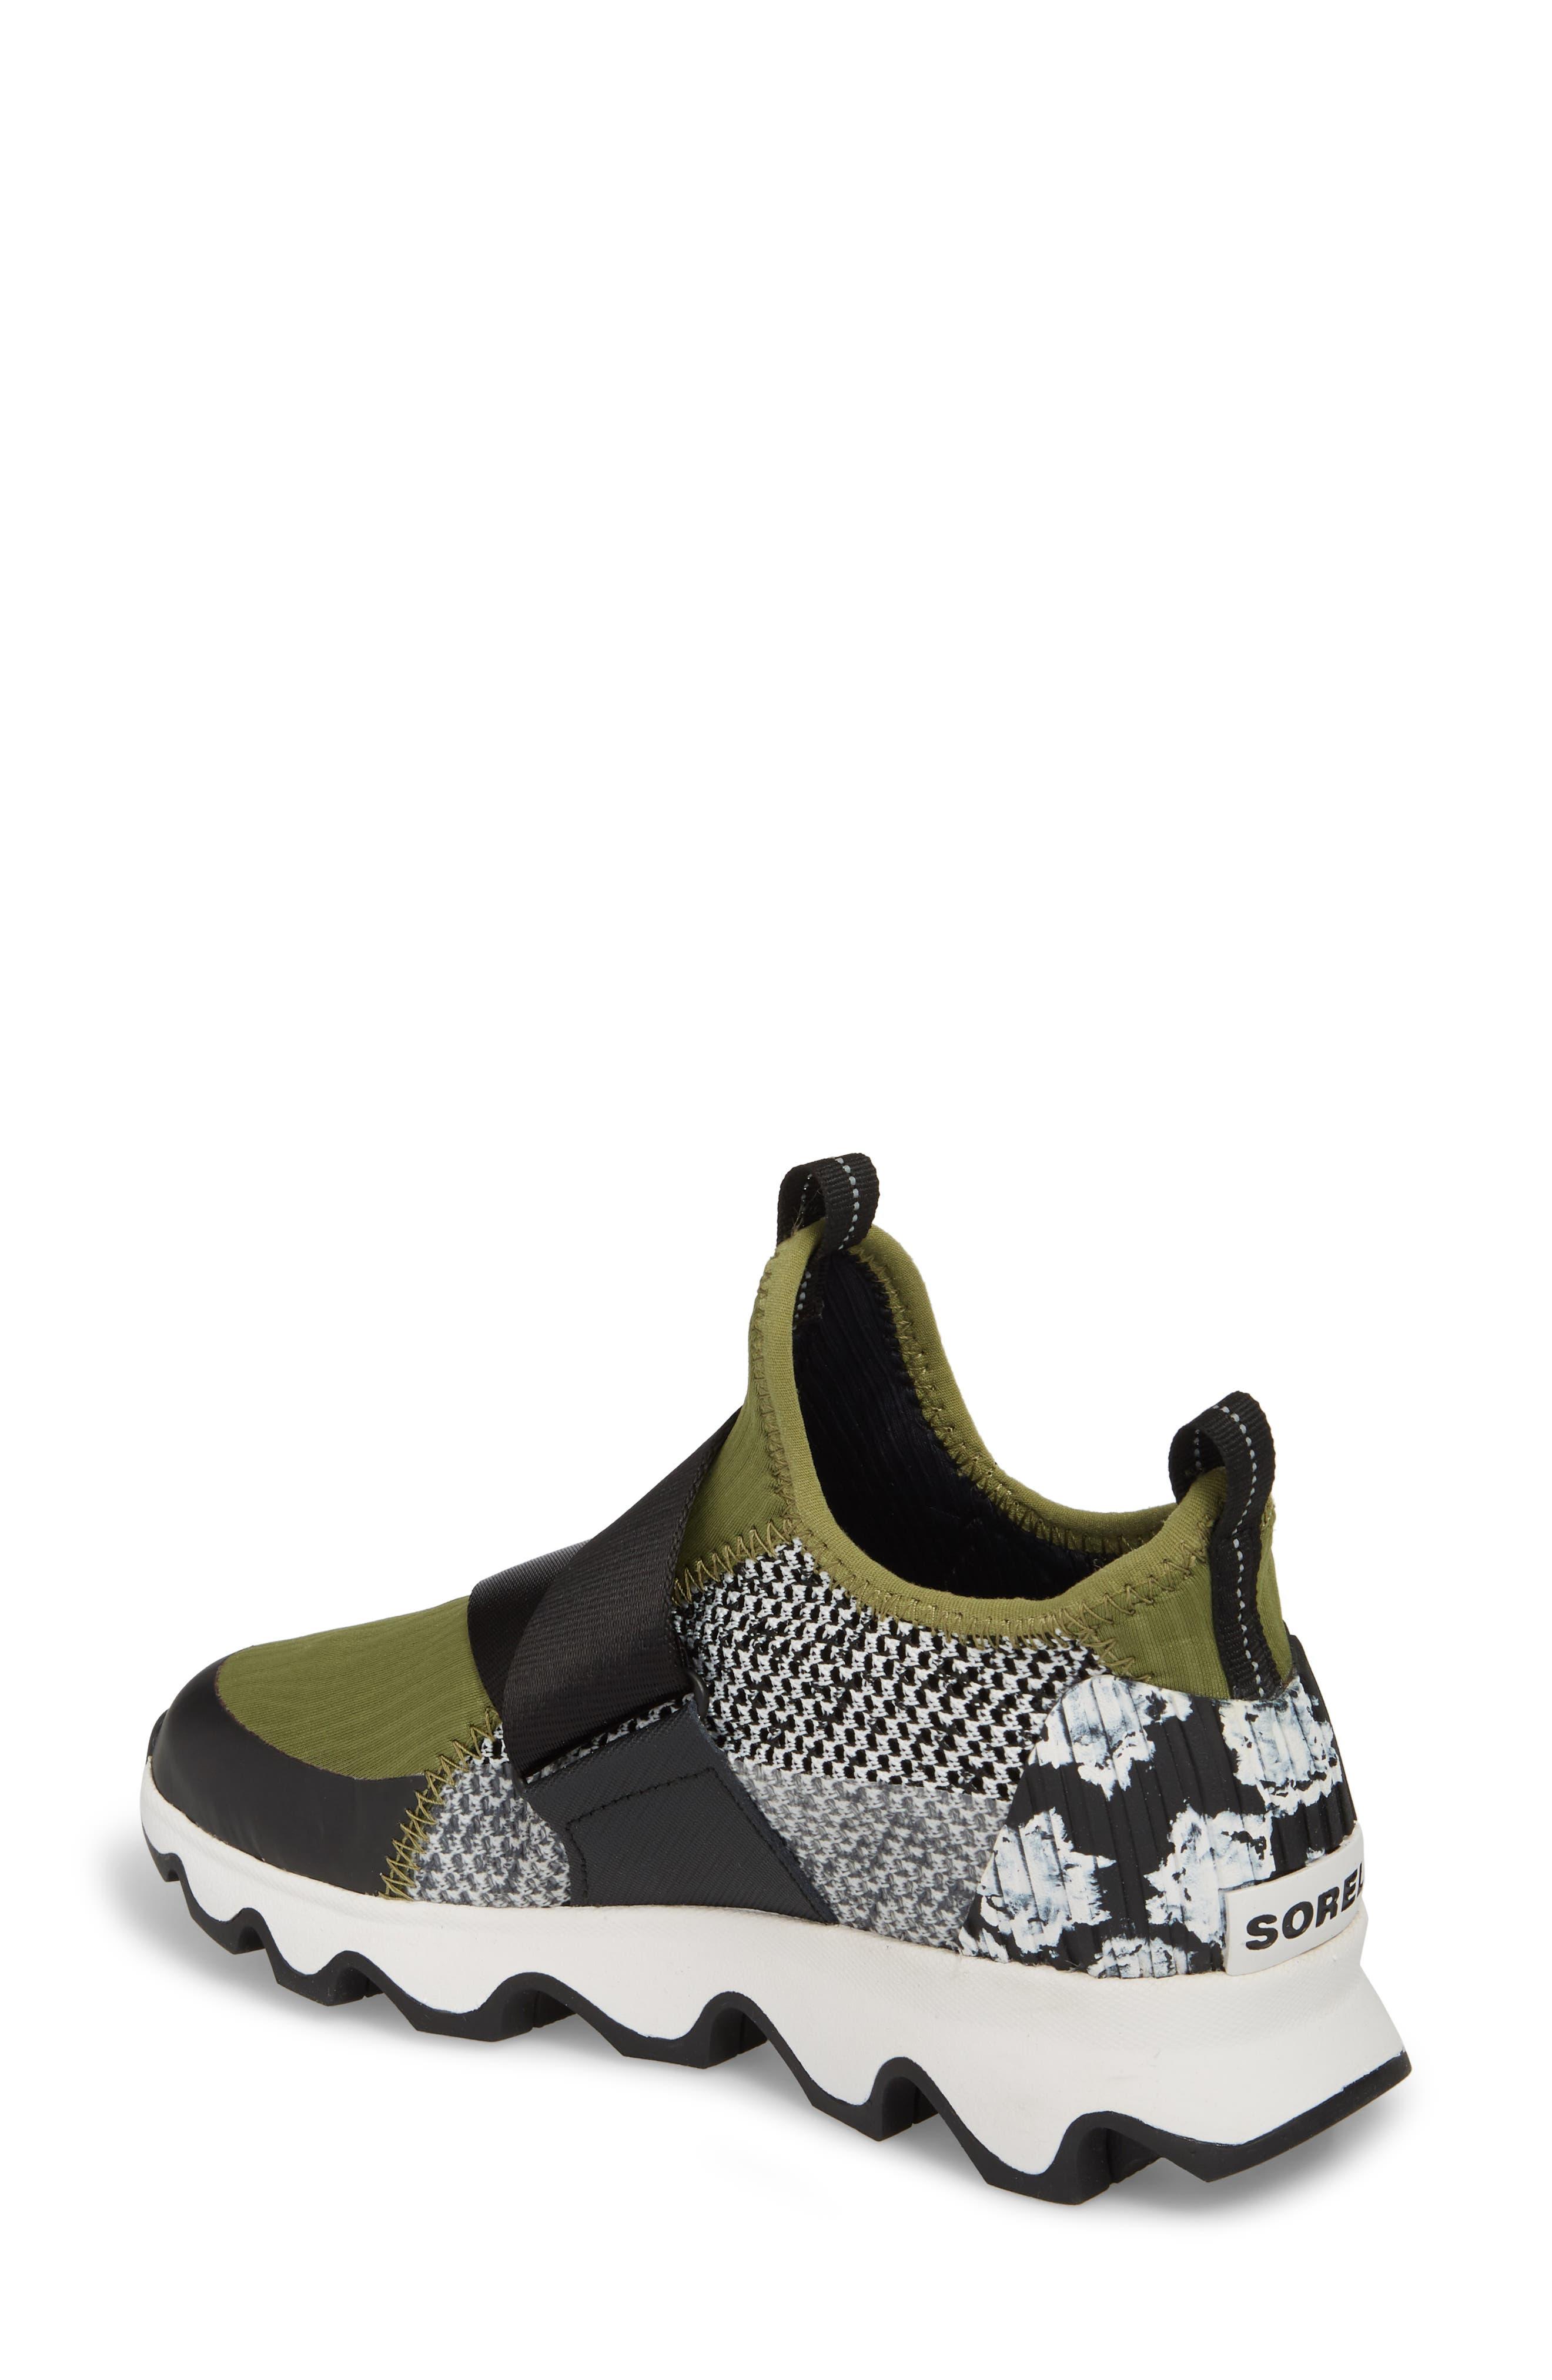 Kinetic Sneak High Top Sneaker,                             Alternate thumbnail 2, color,                             Olive Drab/ White